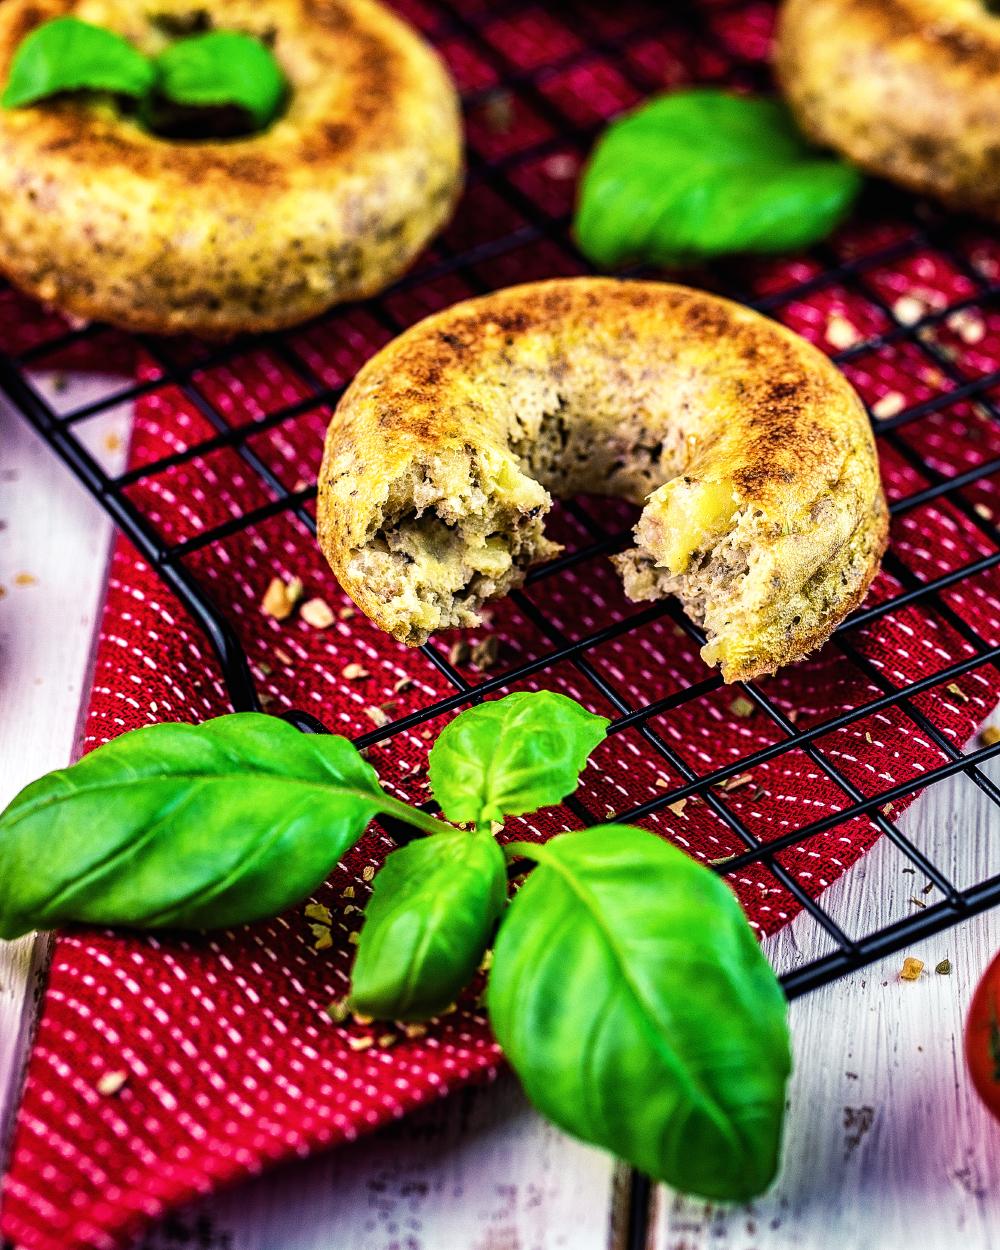 Kartoffel-Ei Frühstücks Donuts – 4 Punkte